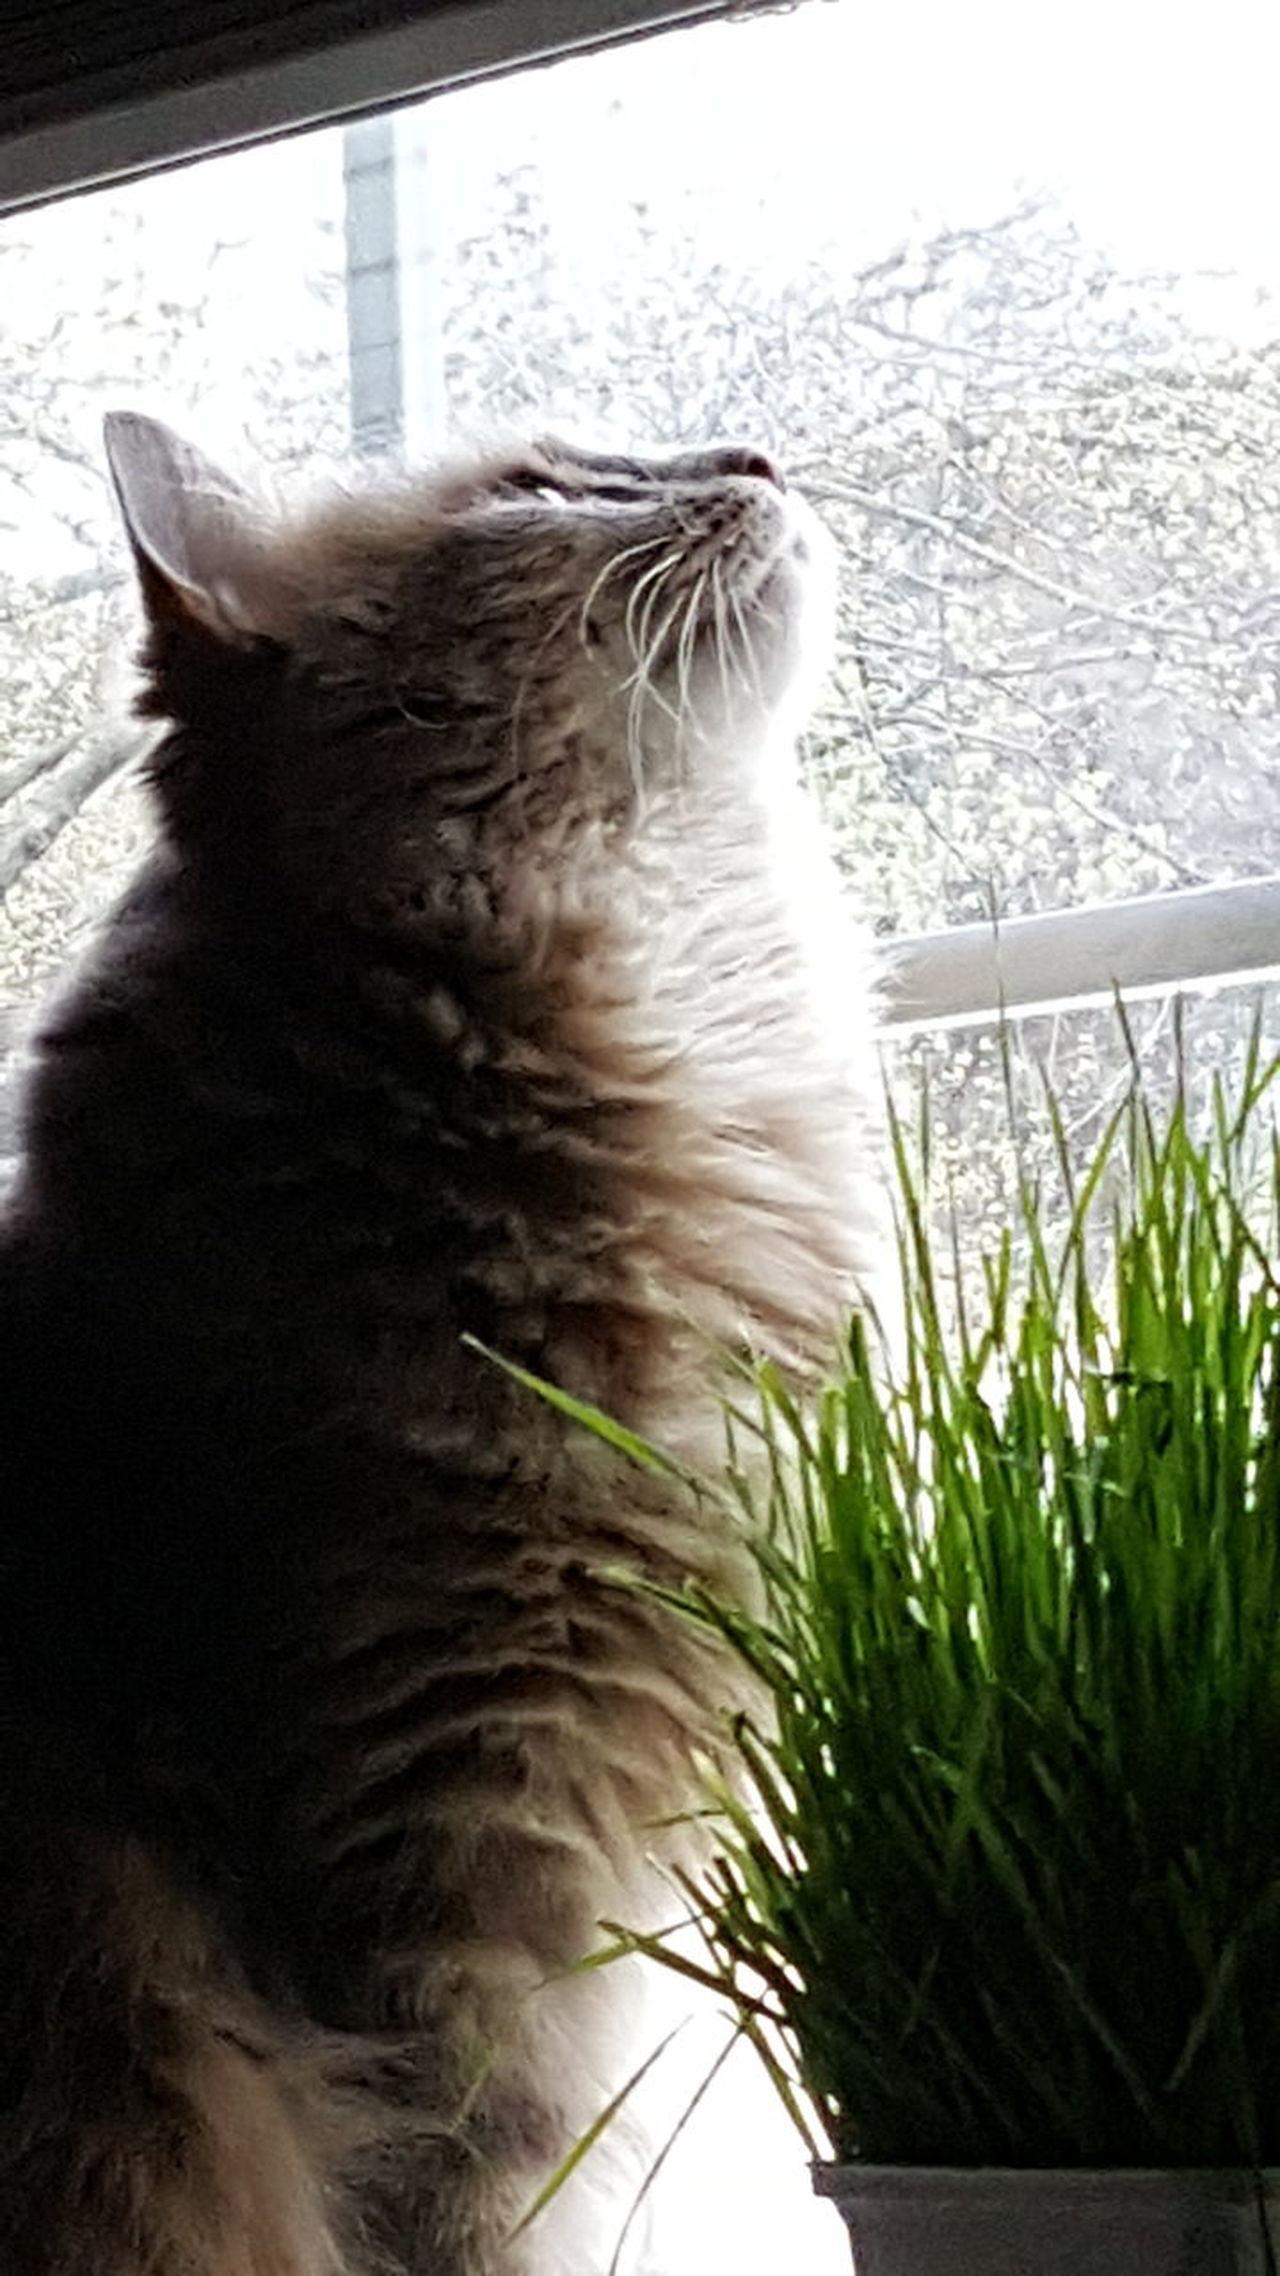 One Animal Domestic Animals No People Mammal Day Outdoors Nature Pets Water Animal Themes Close-up Taking Photos Catnipaddict Catnip Caturday